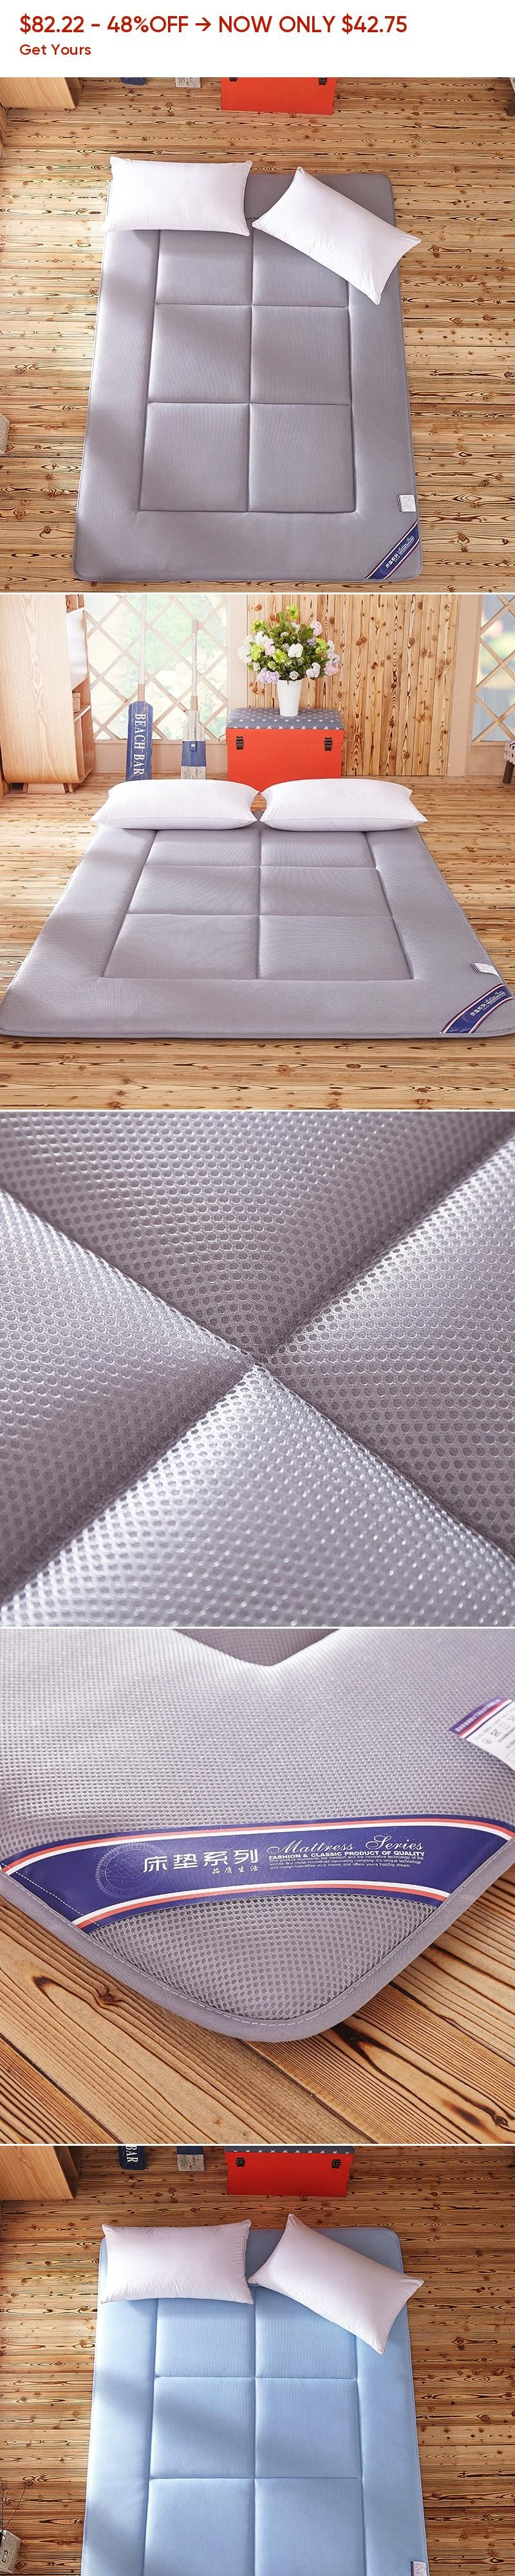 The tatami mattress pad folded back on the floor 1.8 1.5m